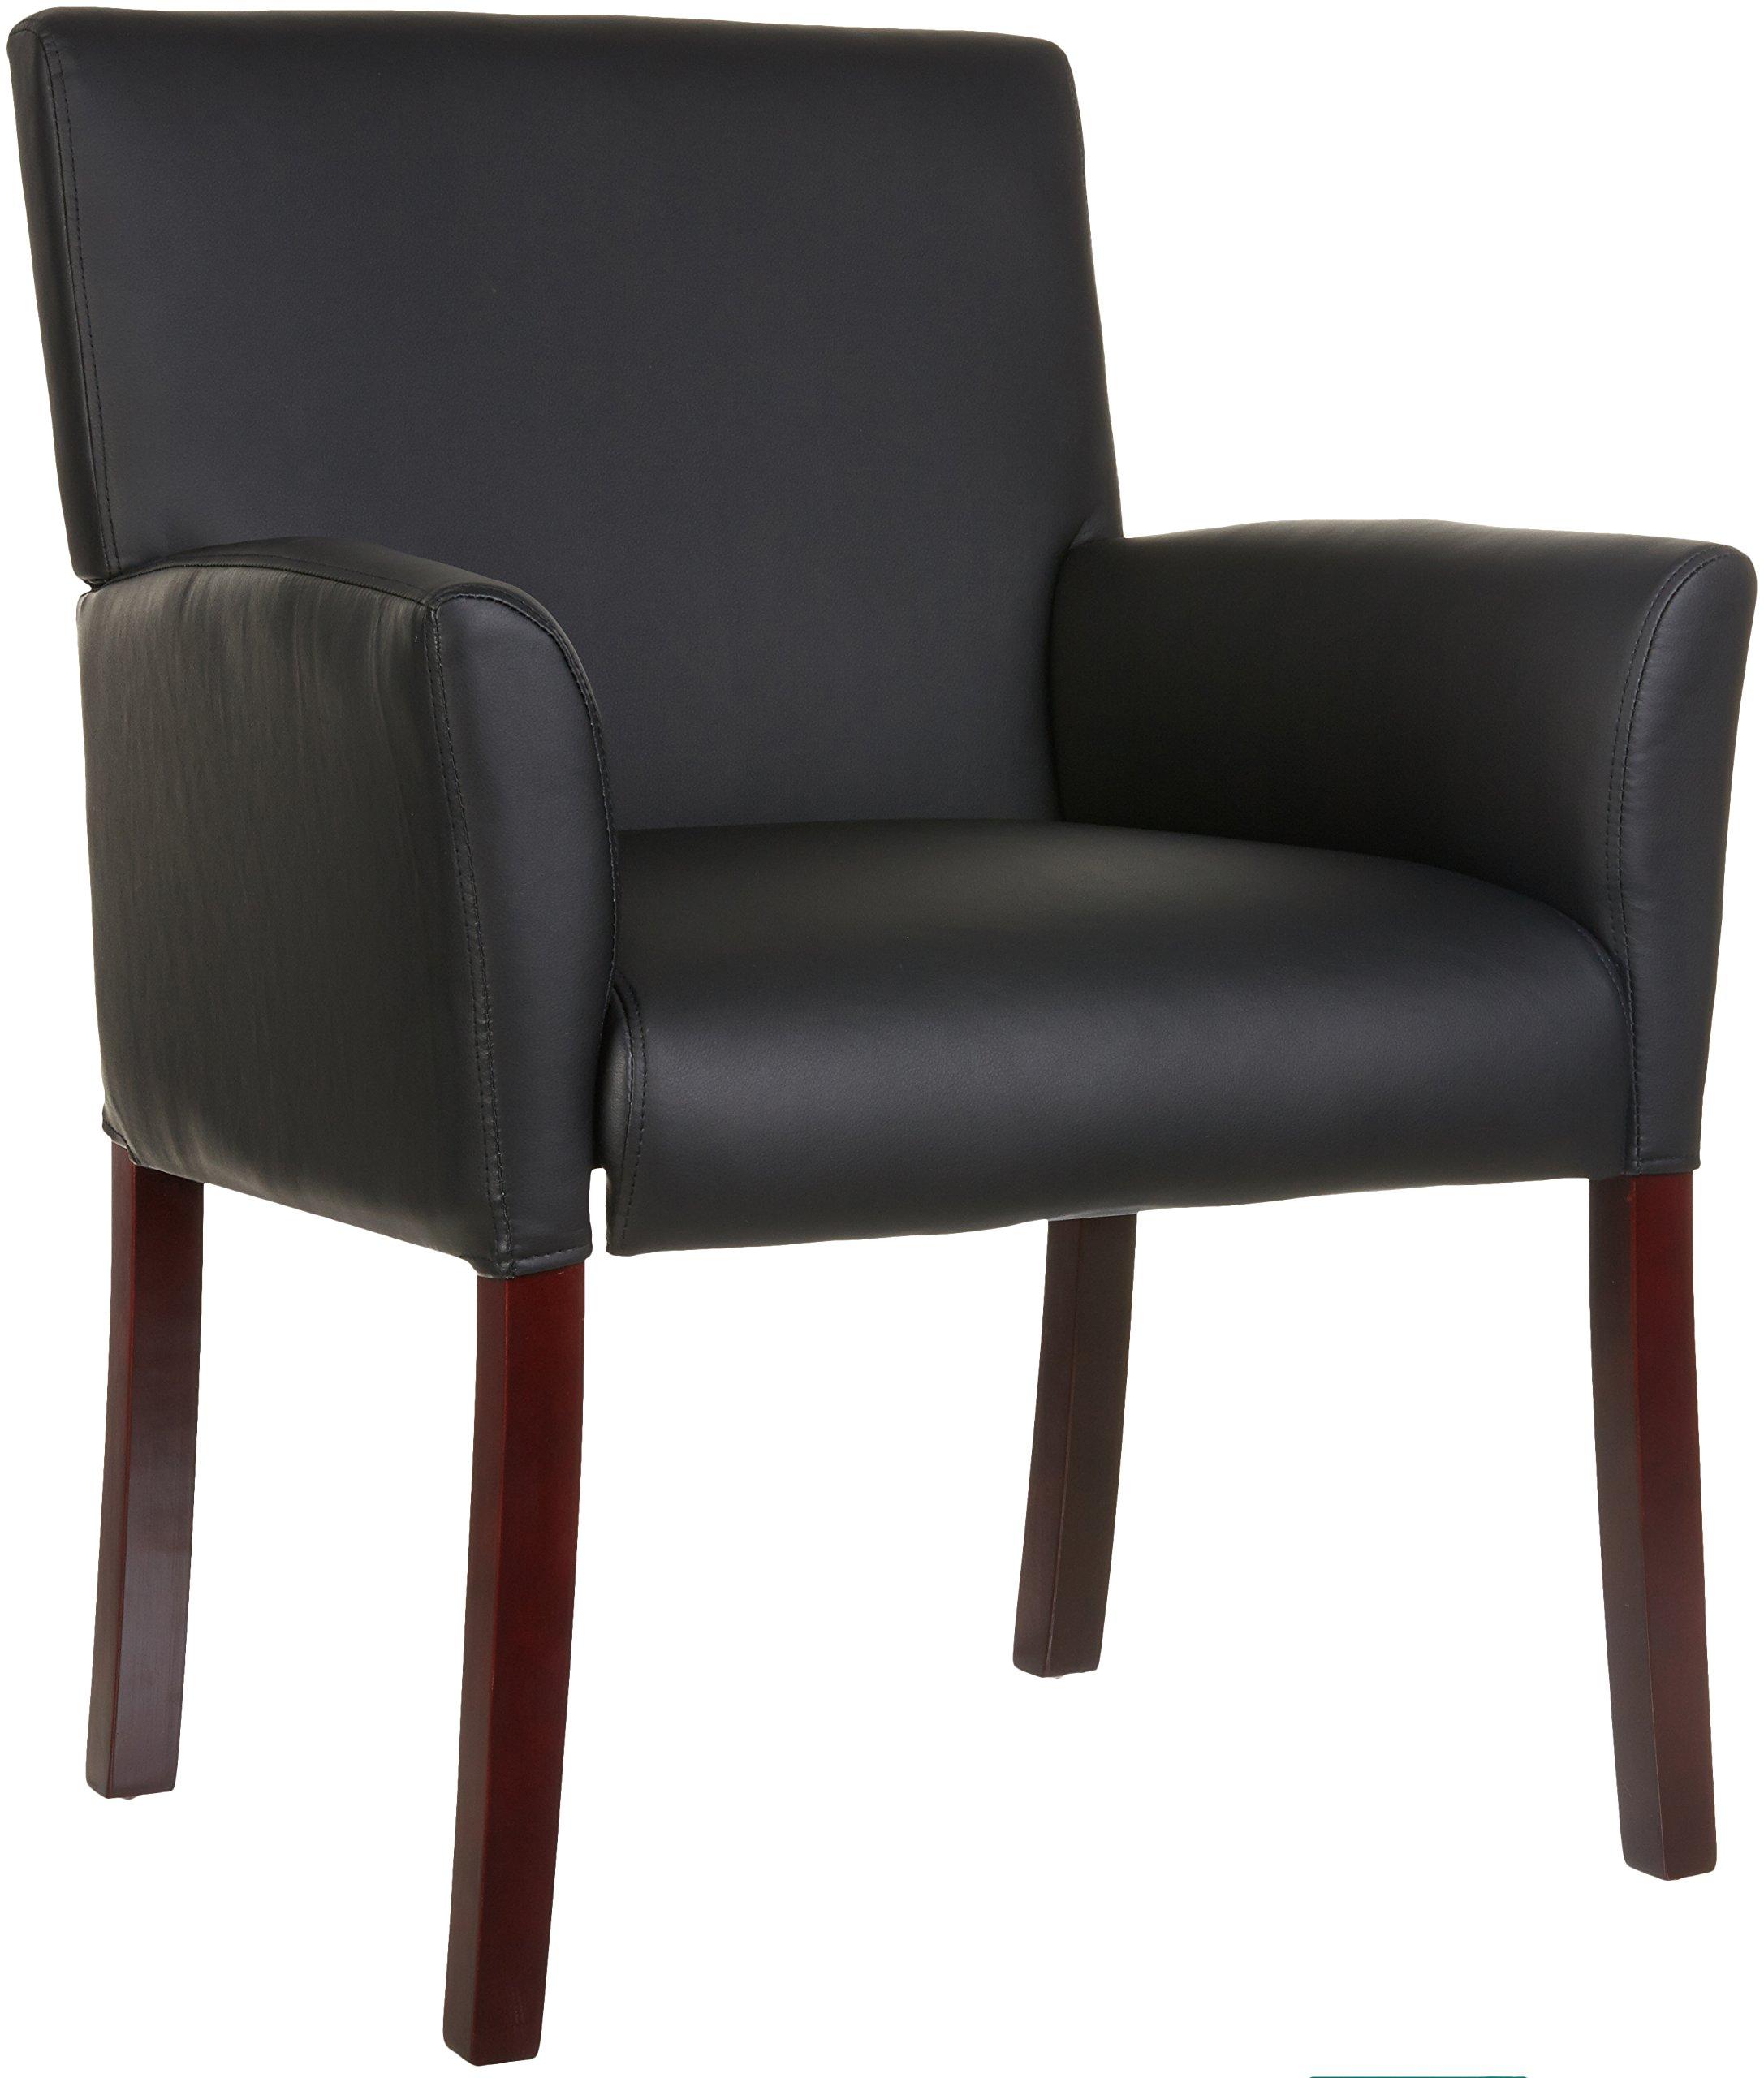 AmazonBasics Reception Chair, Black by AmazonBasics (Image #1)